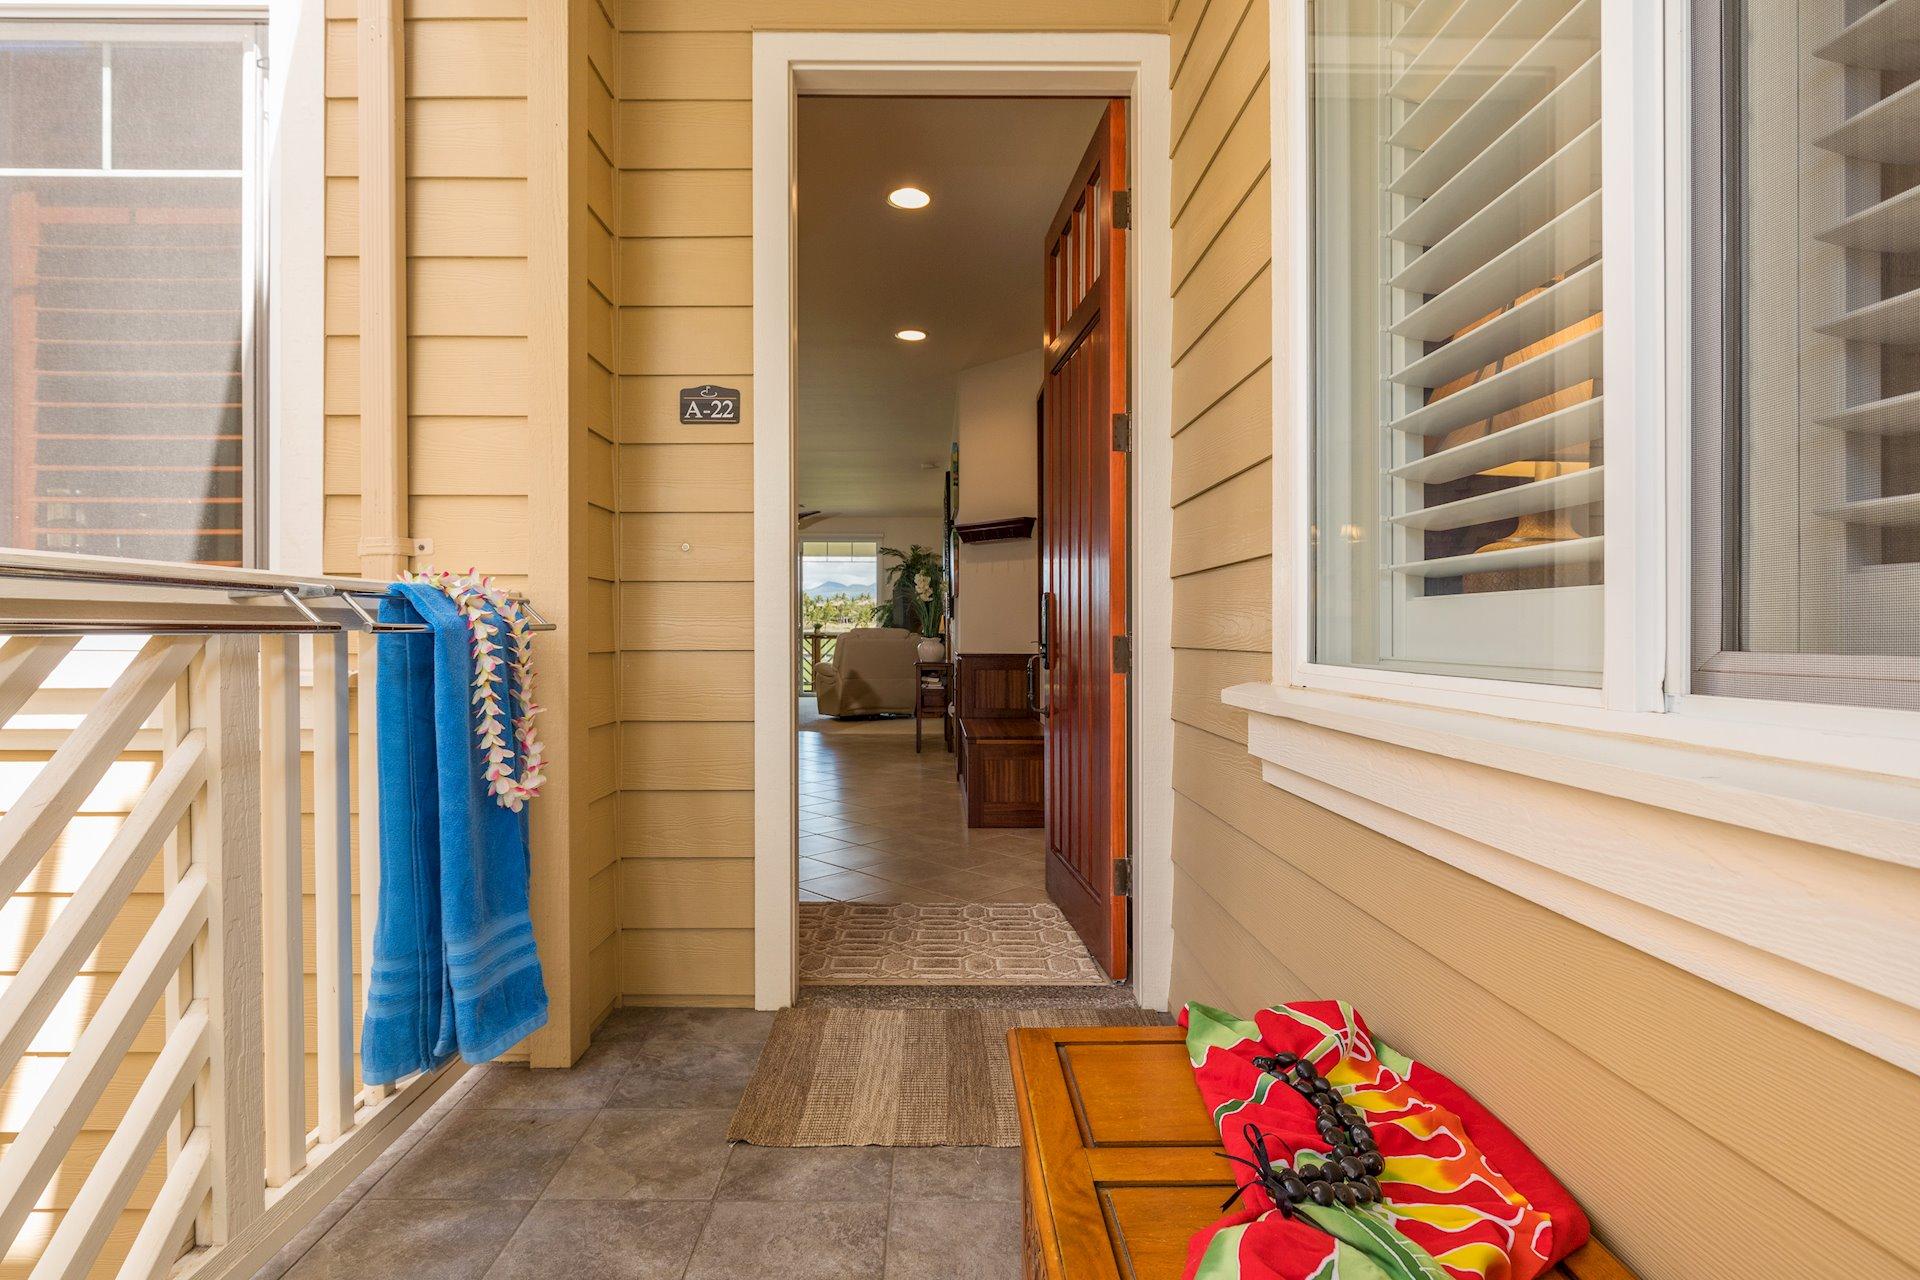 Entry lanai with towel racks